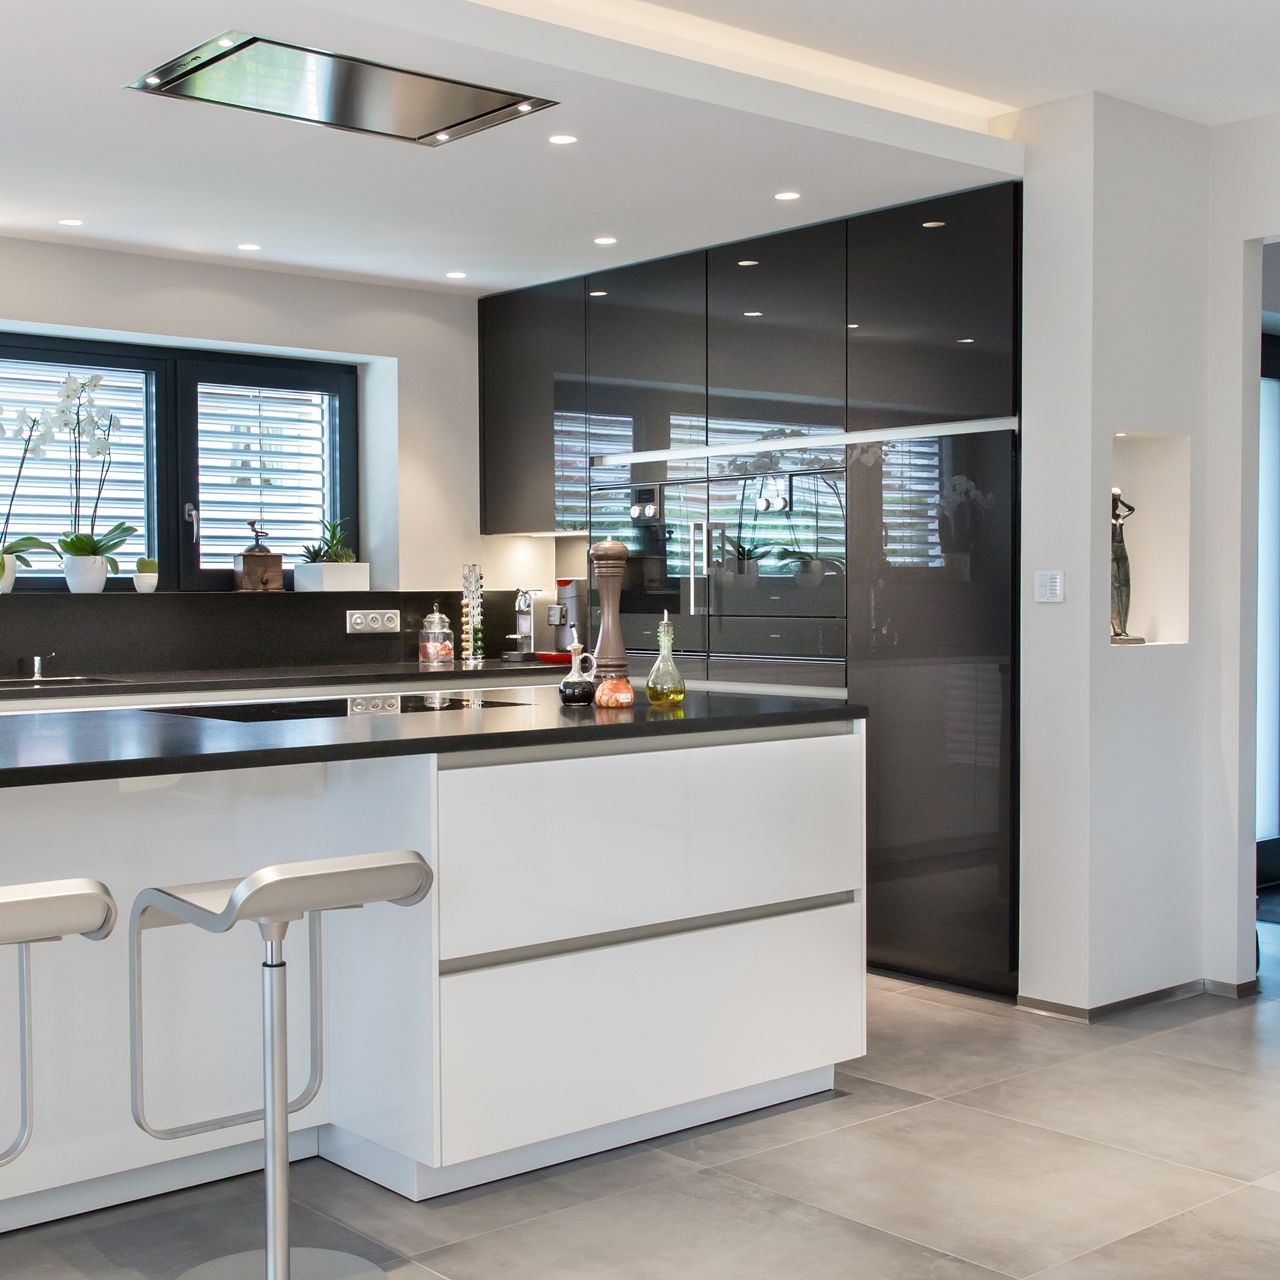 Sleek Modern Black And White SieMatic Kitchen In An Energy - Colmar cuisine creation